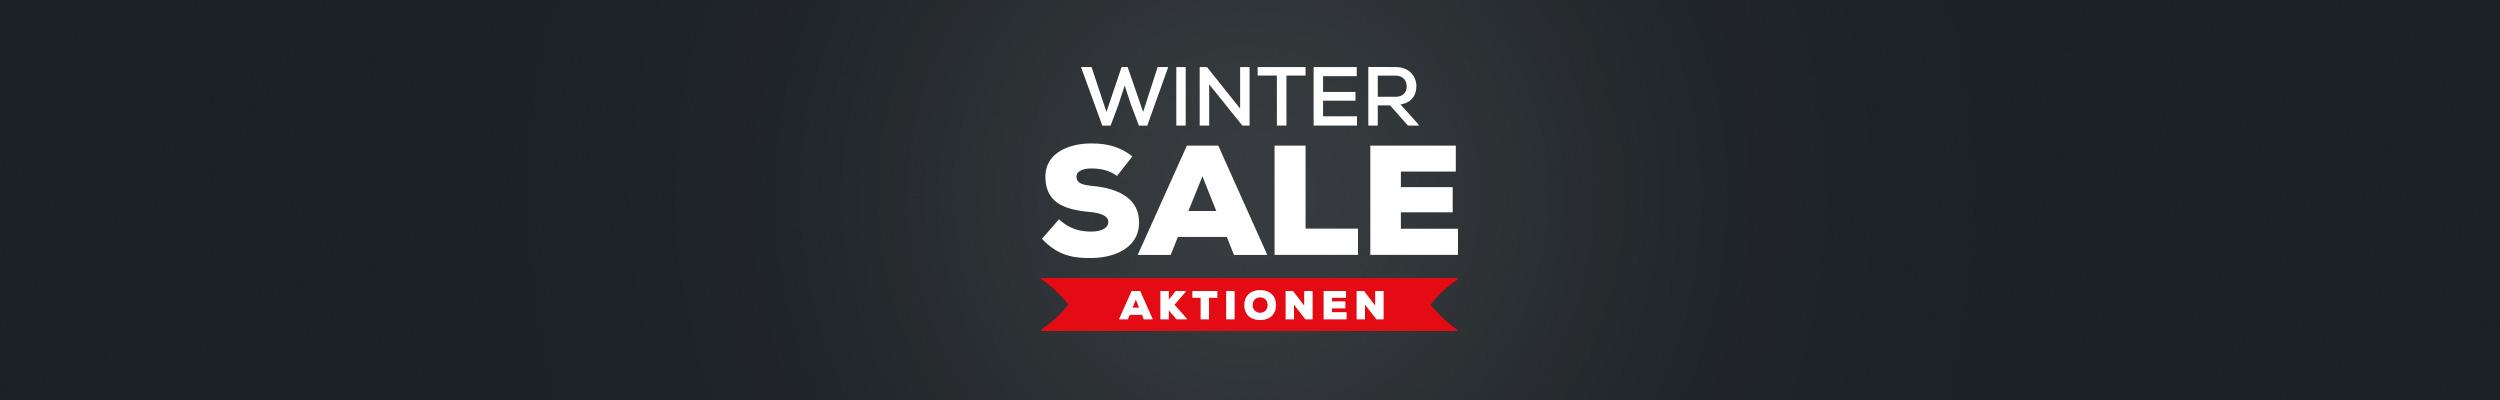 Winter Sale Aktionen | Swiss Sense